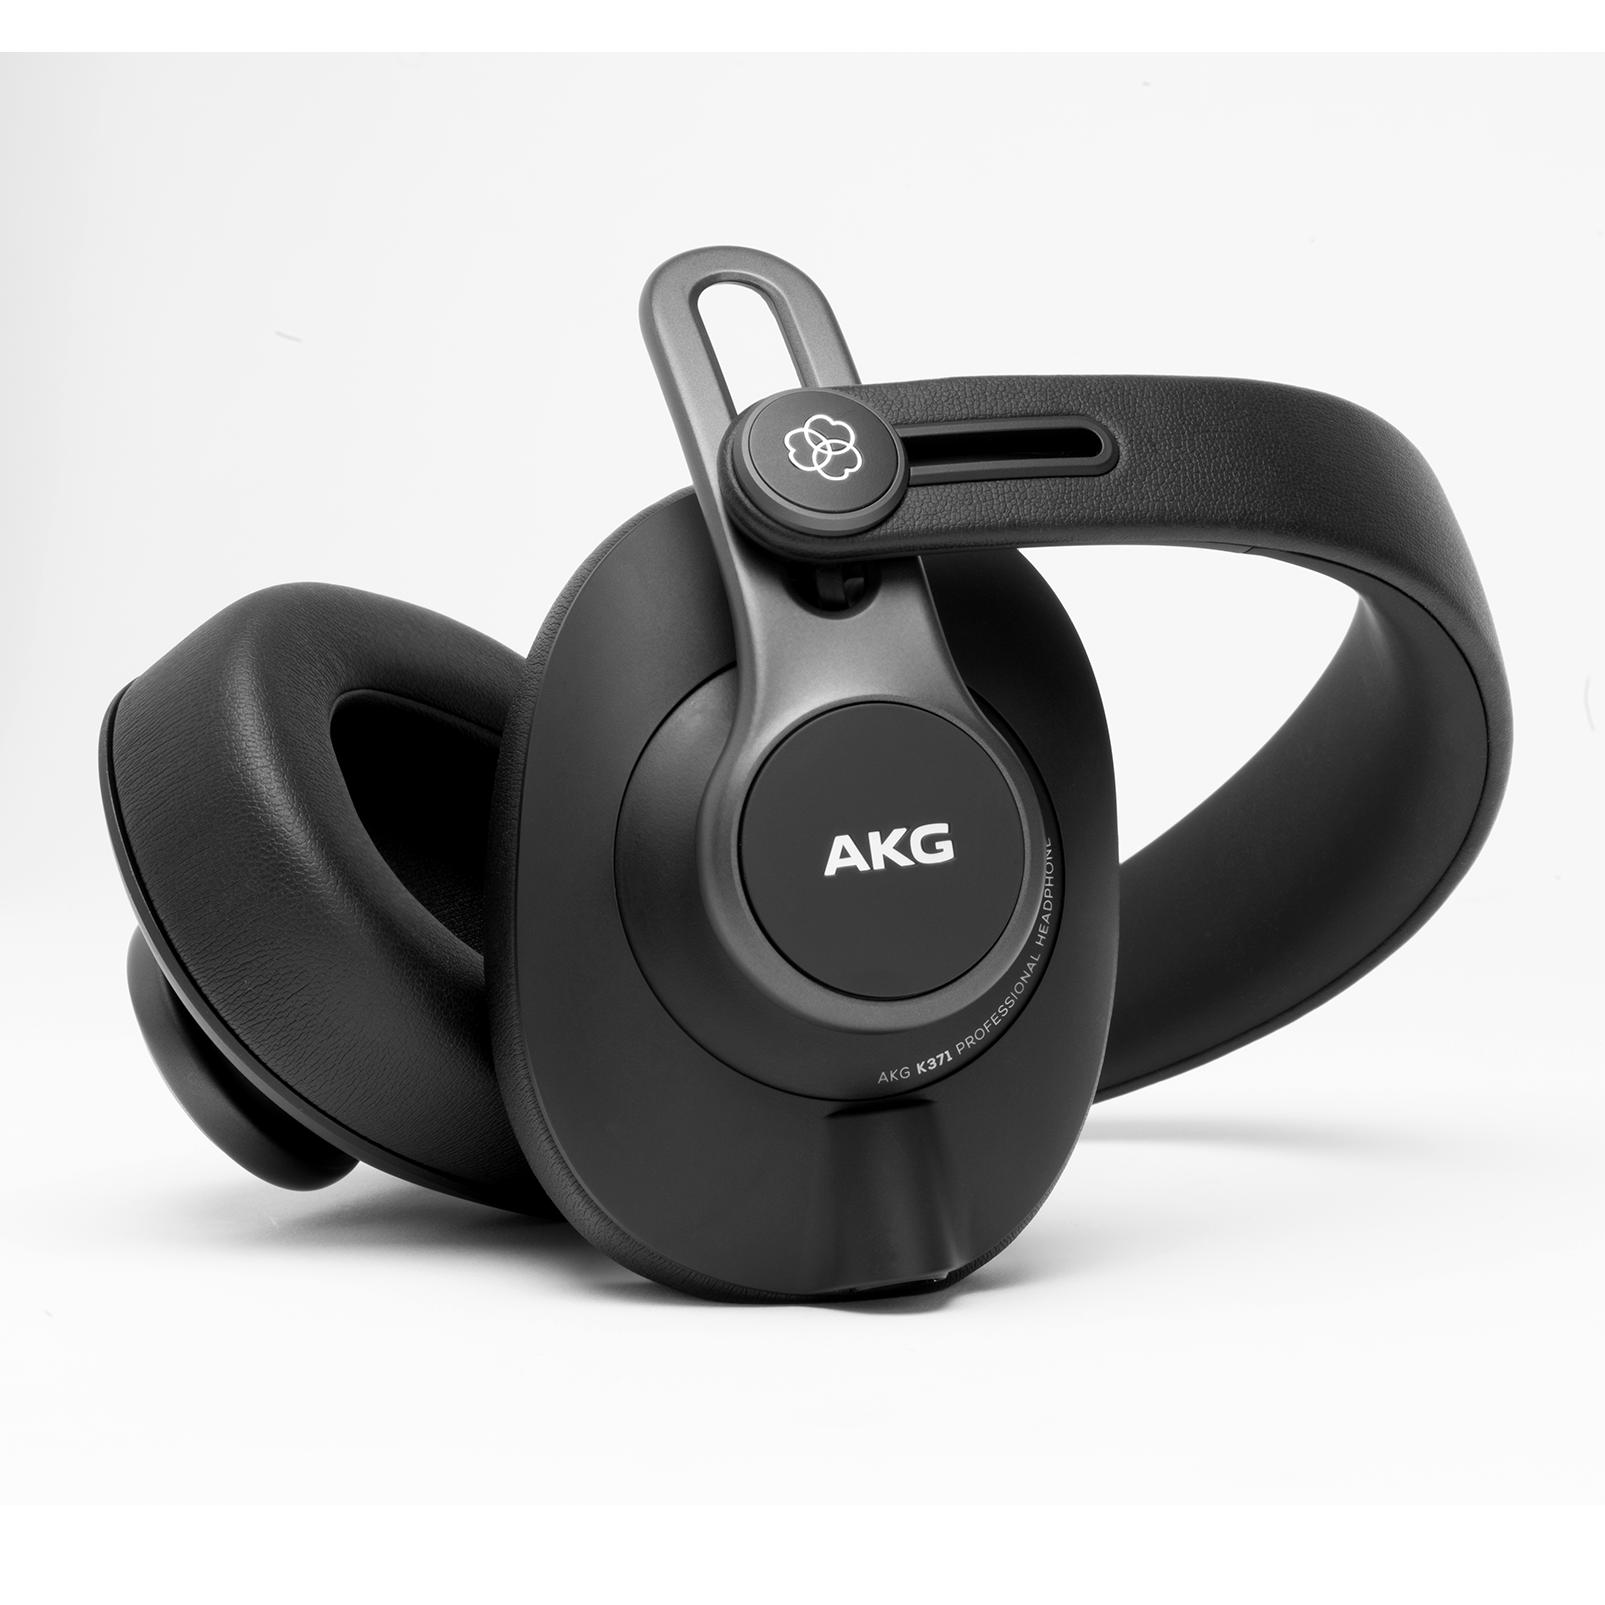 K371 - Black - Over-ear, closed-back, foldable studio headphones - Detailshot 1